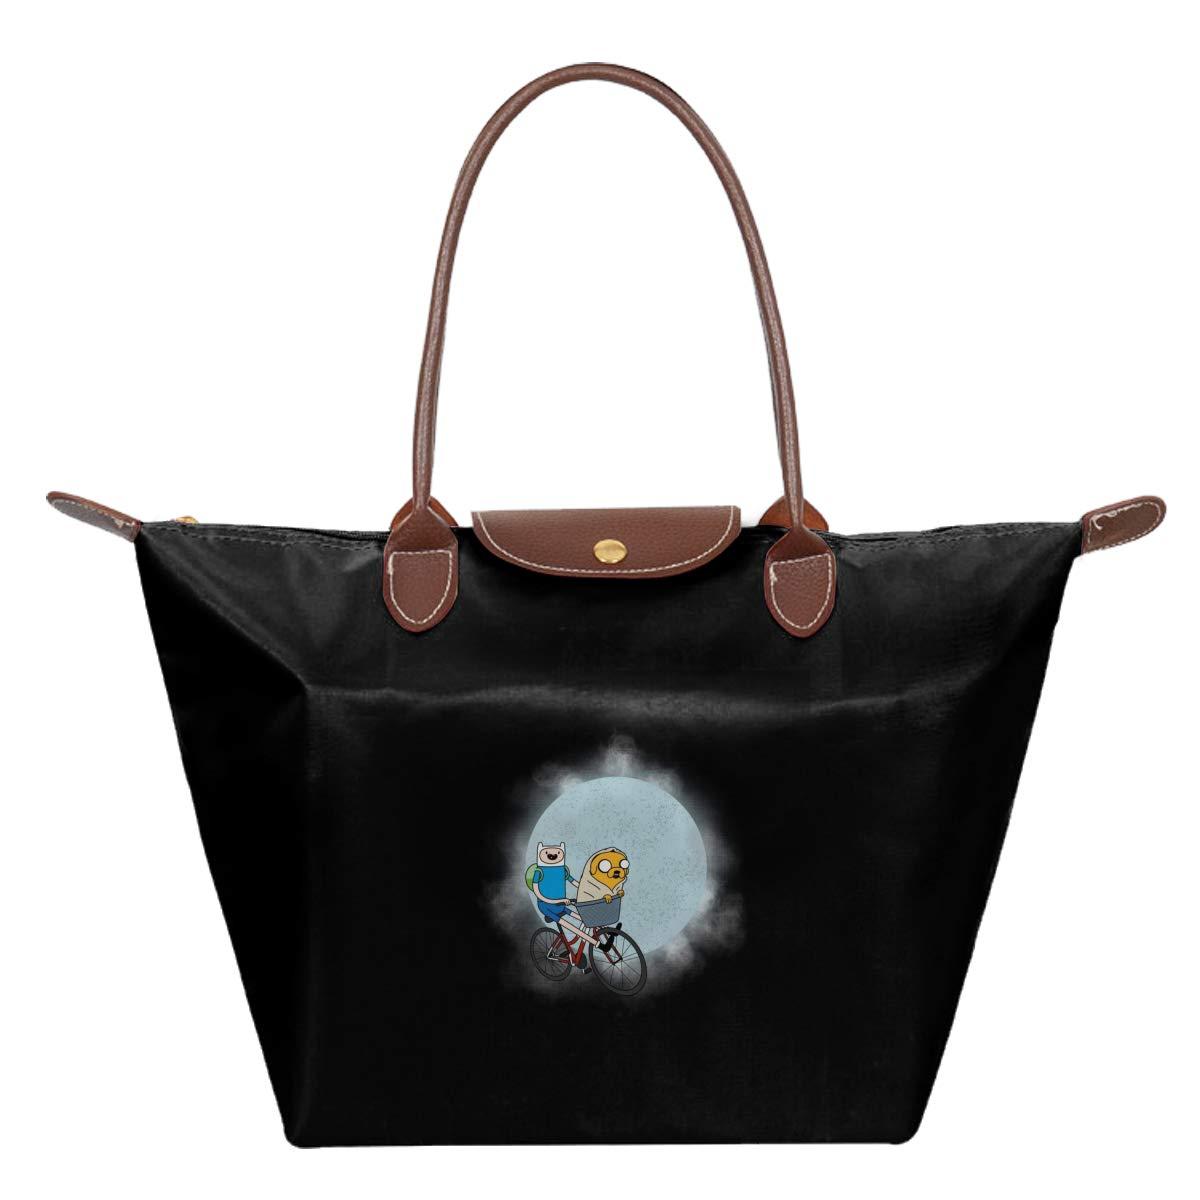 Adventure Time ET Mix Waterproof Leather Folded Messenger Nylon Bag Travel Tote Hopping Folding School Handbags